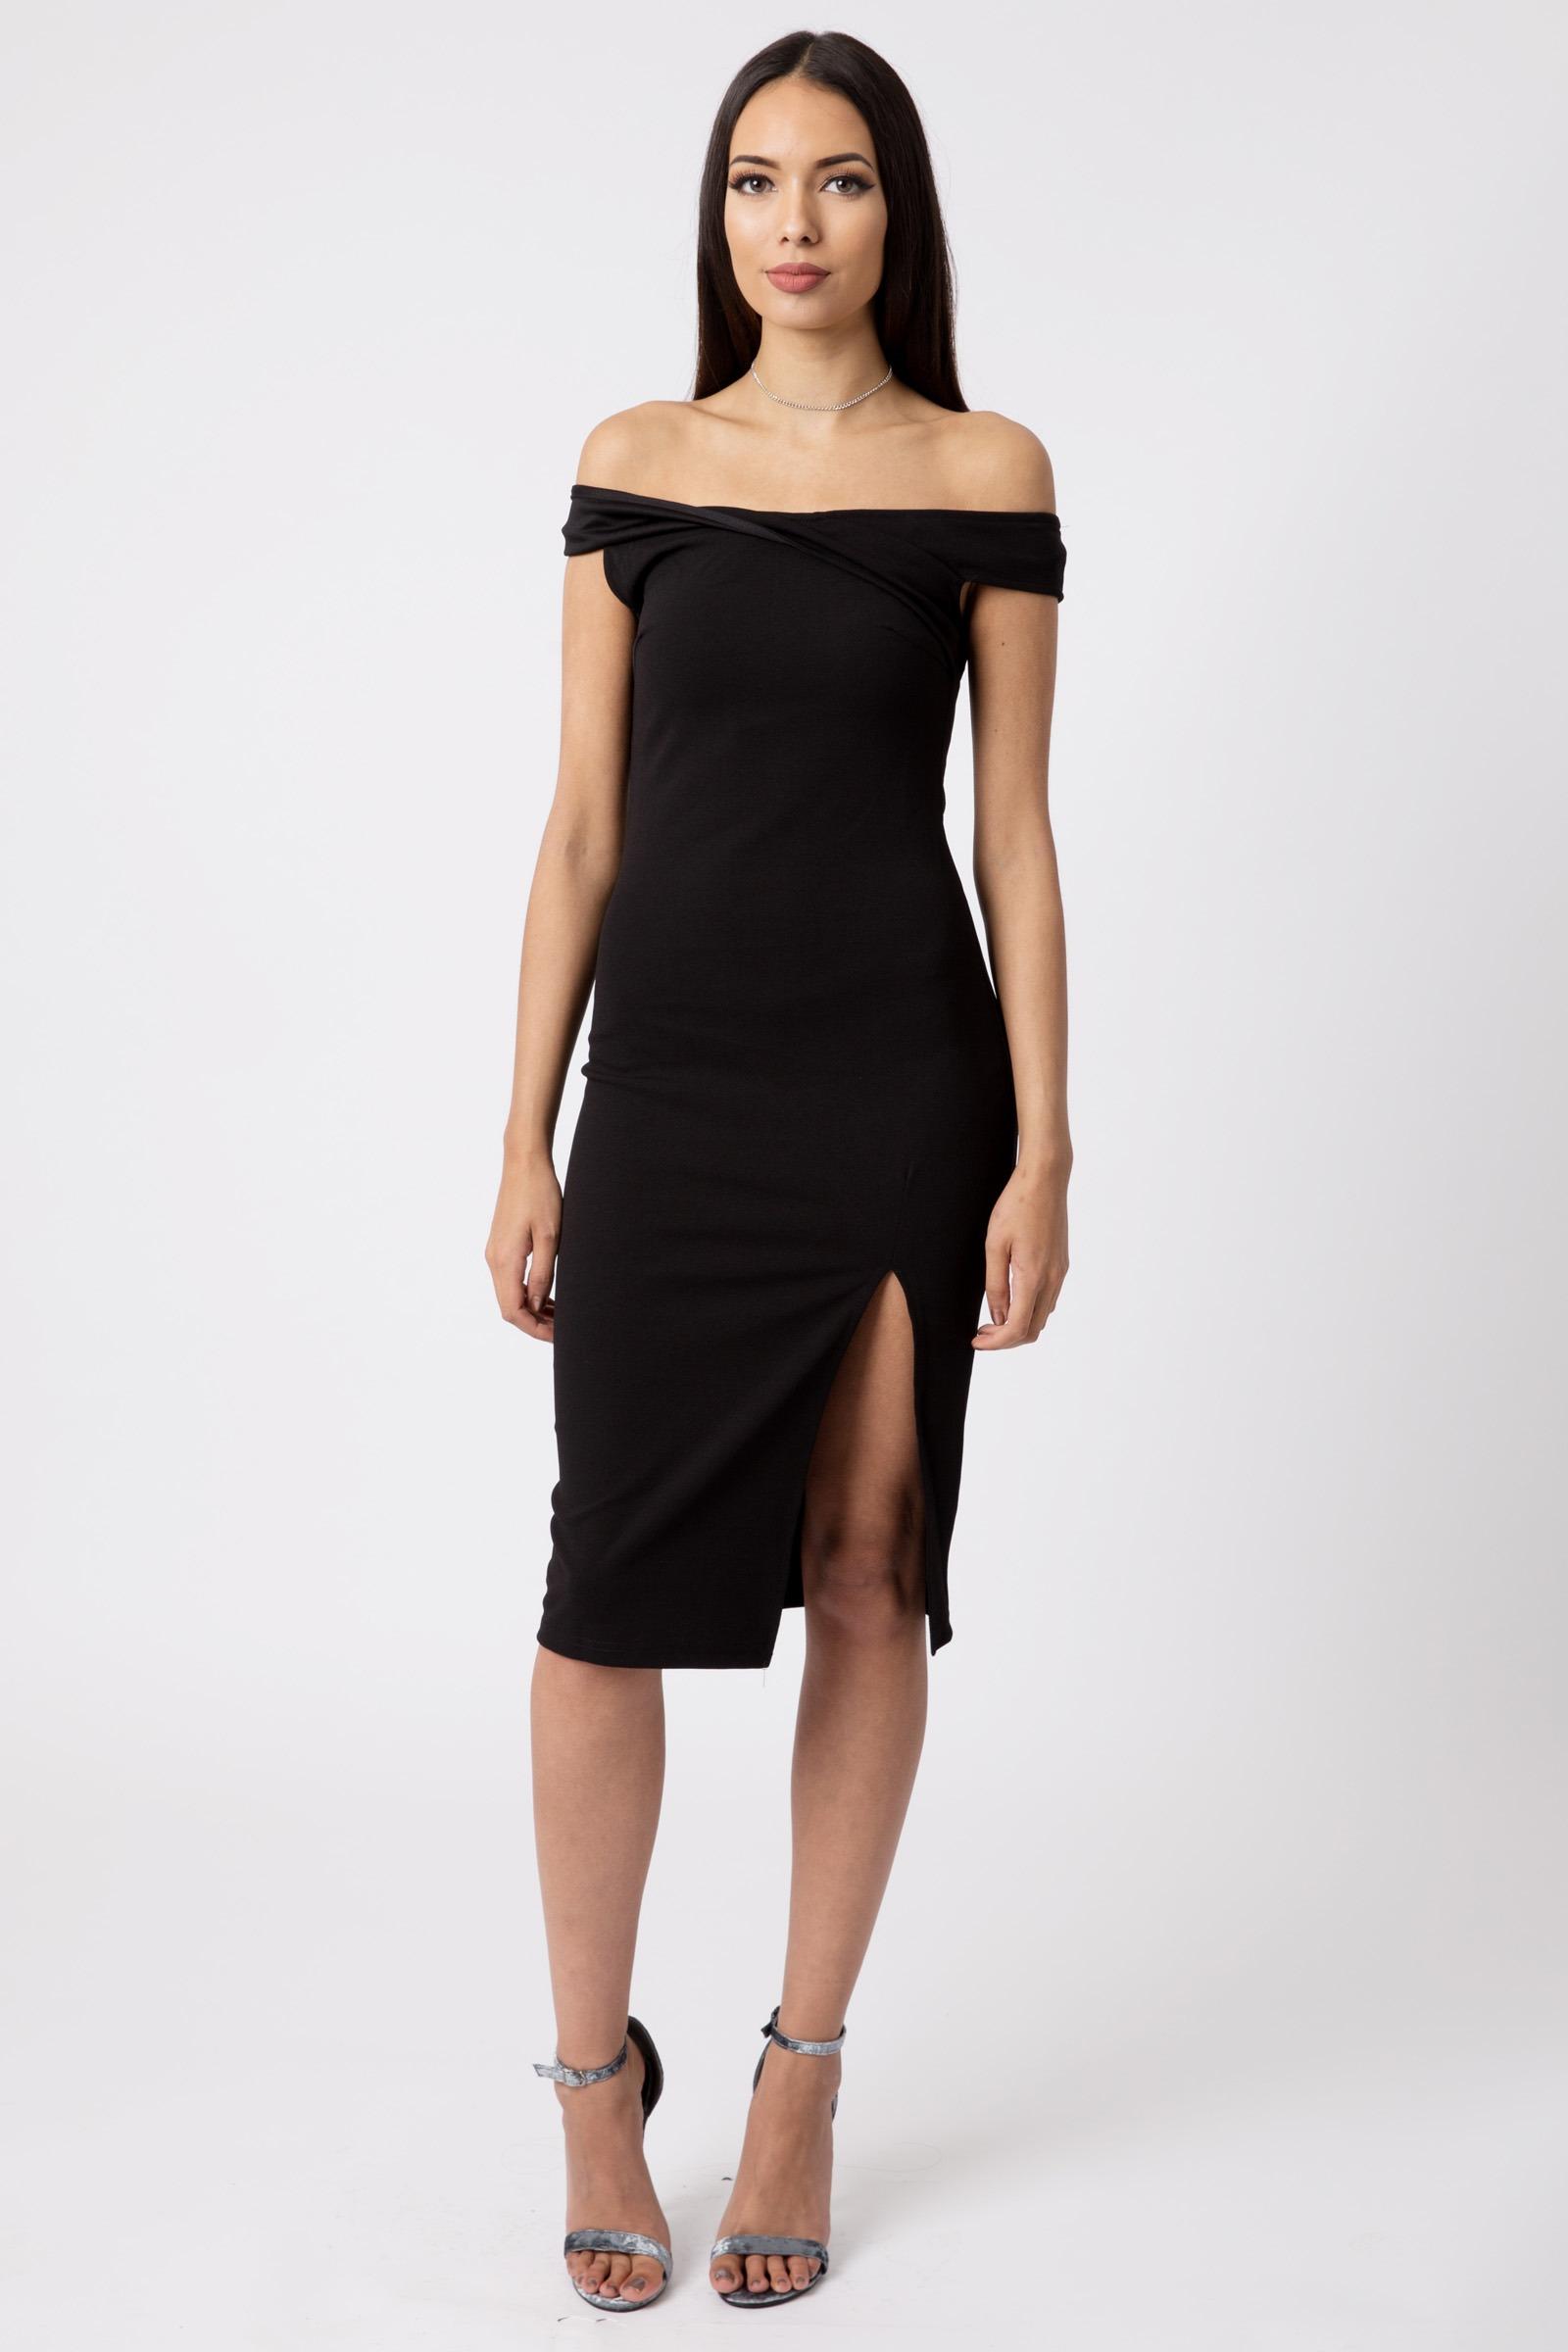 c1c24e66be47 Black Off Shoulder Thigh Split Bodycon Dress